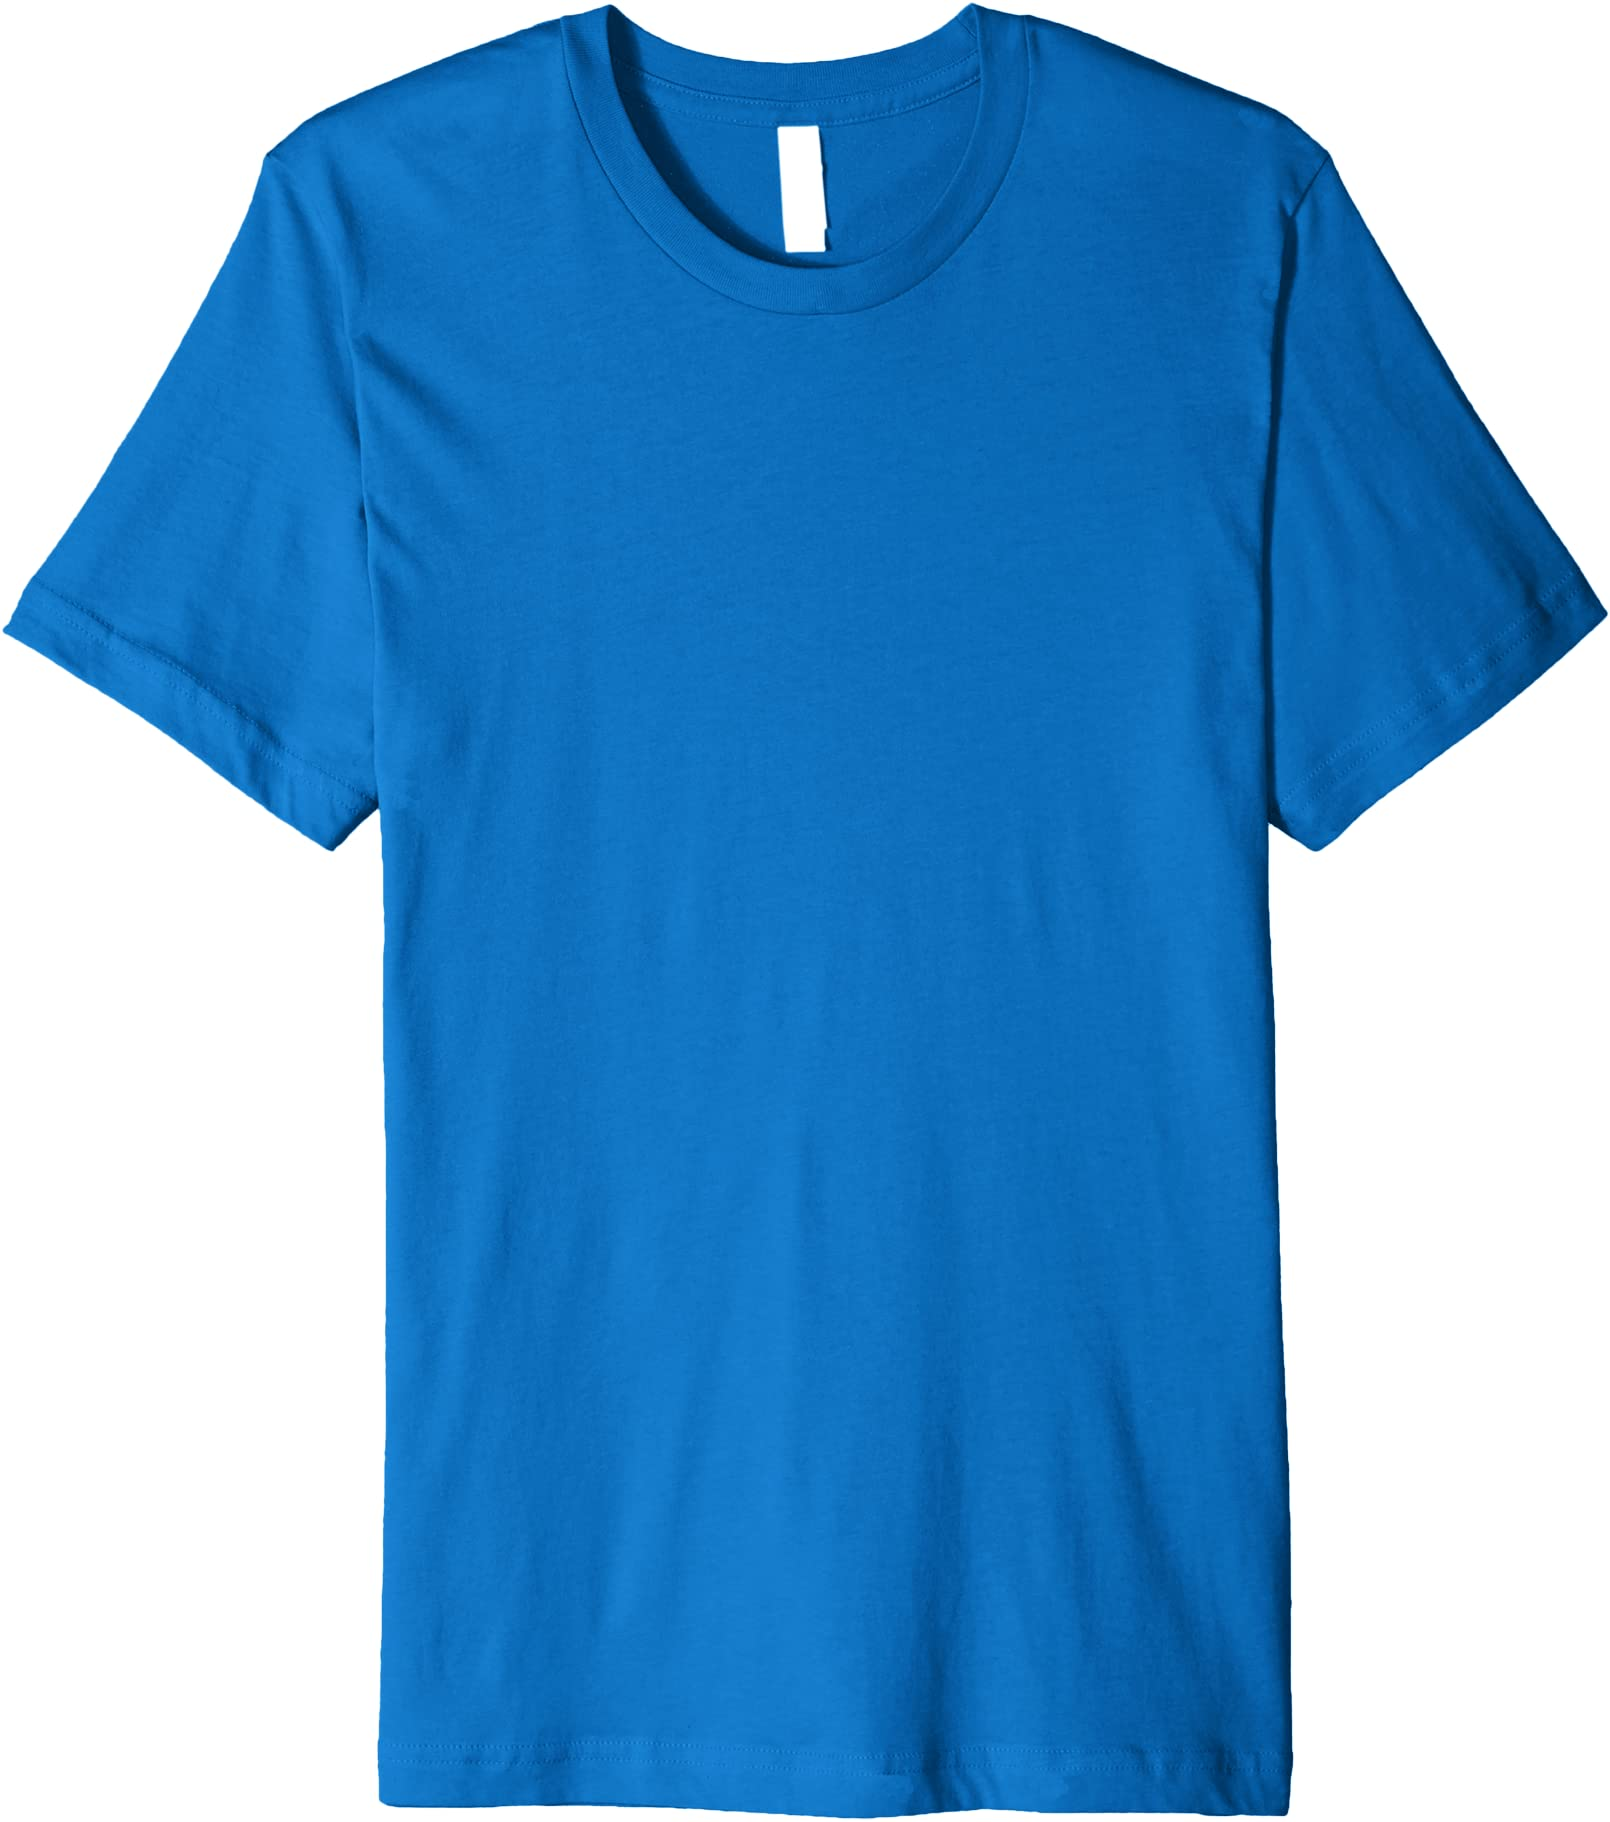 Gym Unicorn Workout T-Shirt Mens Funny T-Shirt